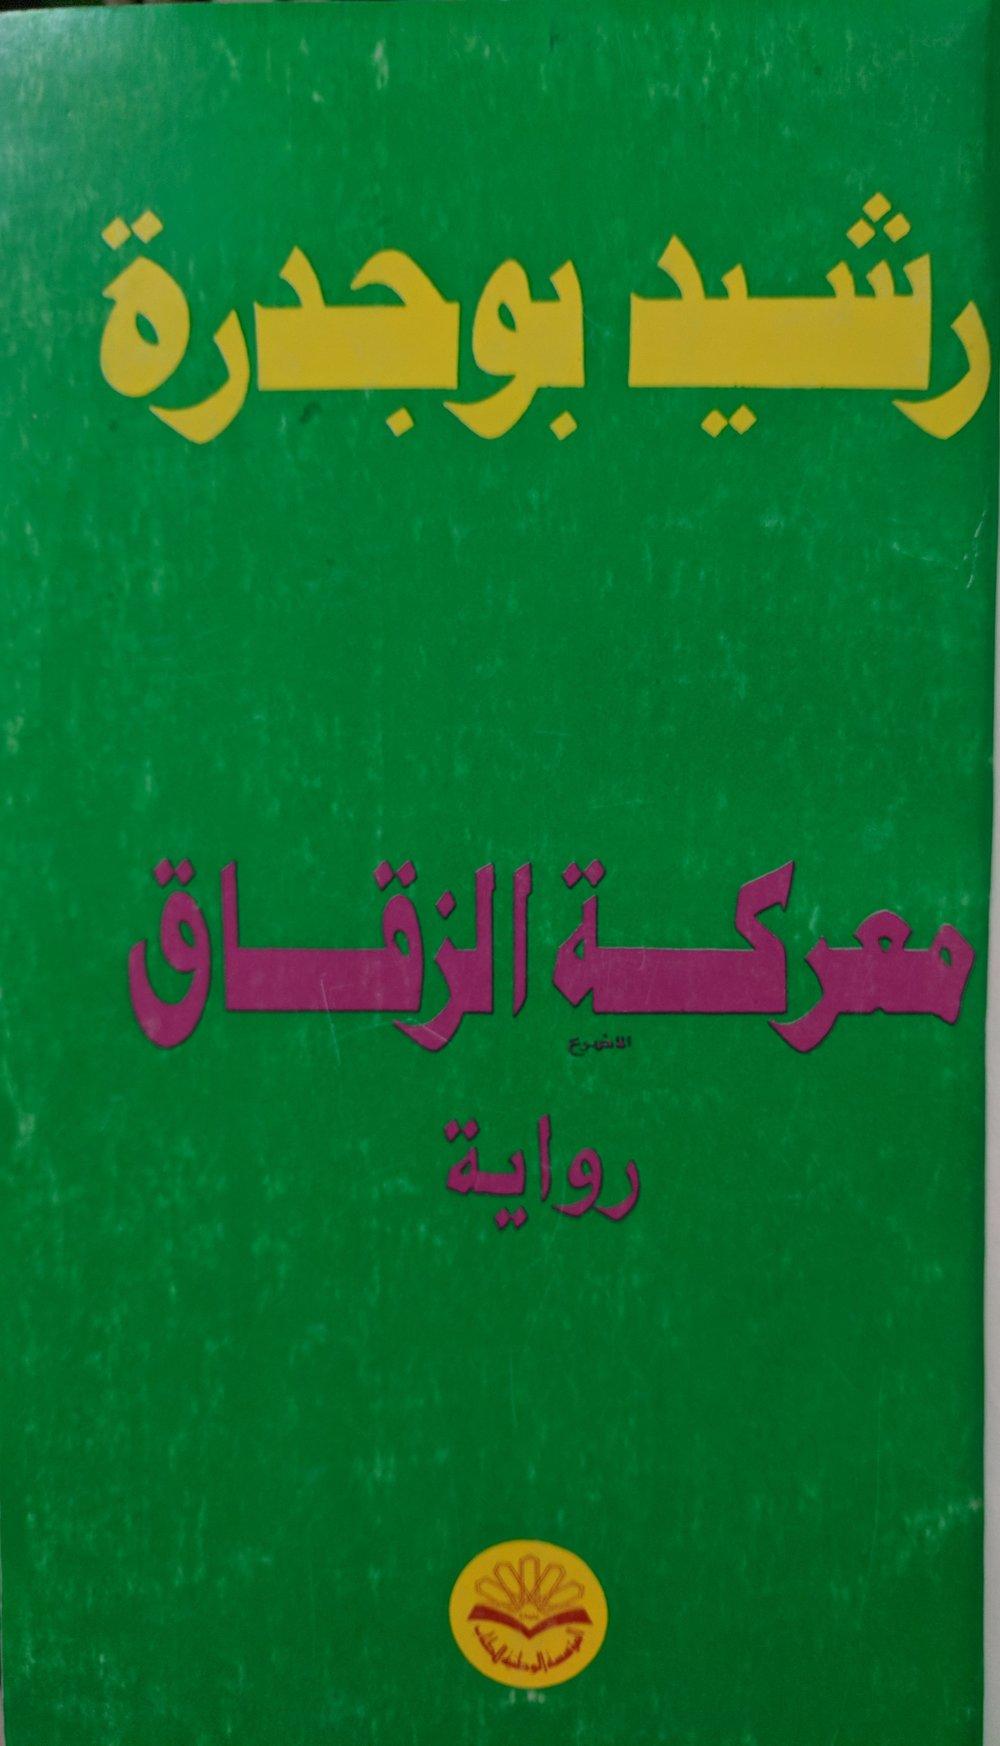 al-Jazā'ir: al-Mu'assasah al-Waṭanīyah li-l-Kitāb, 1986.